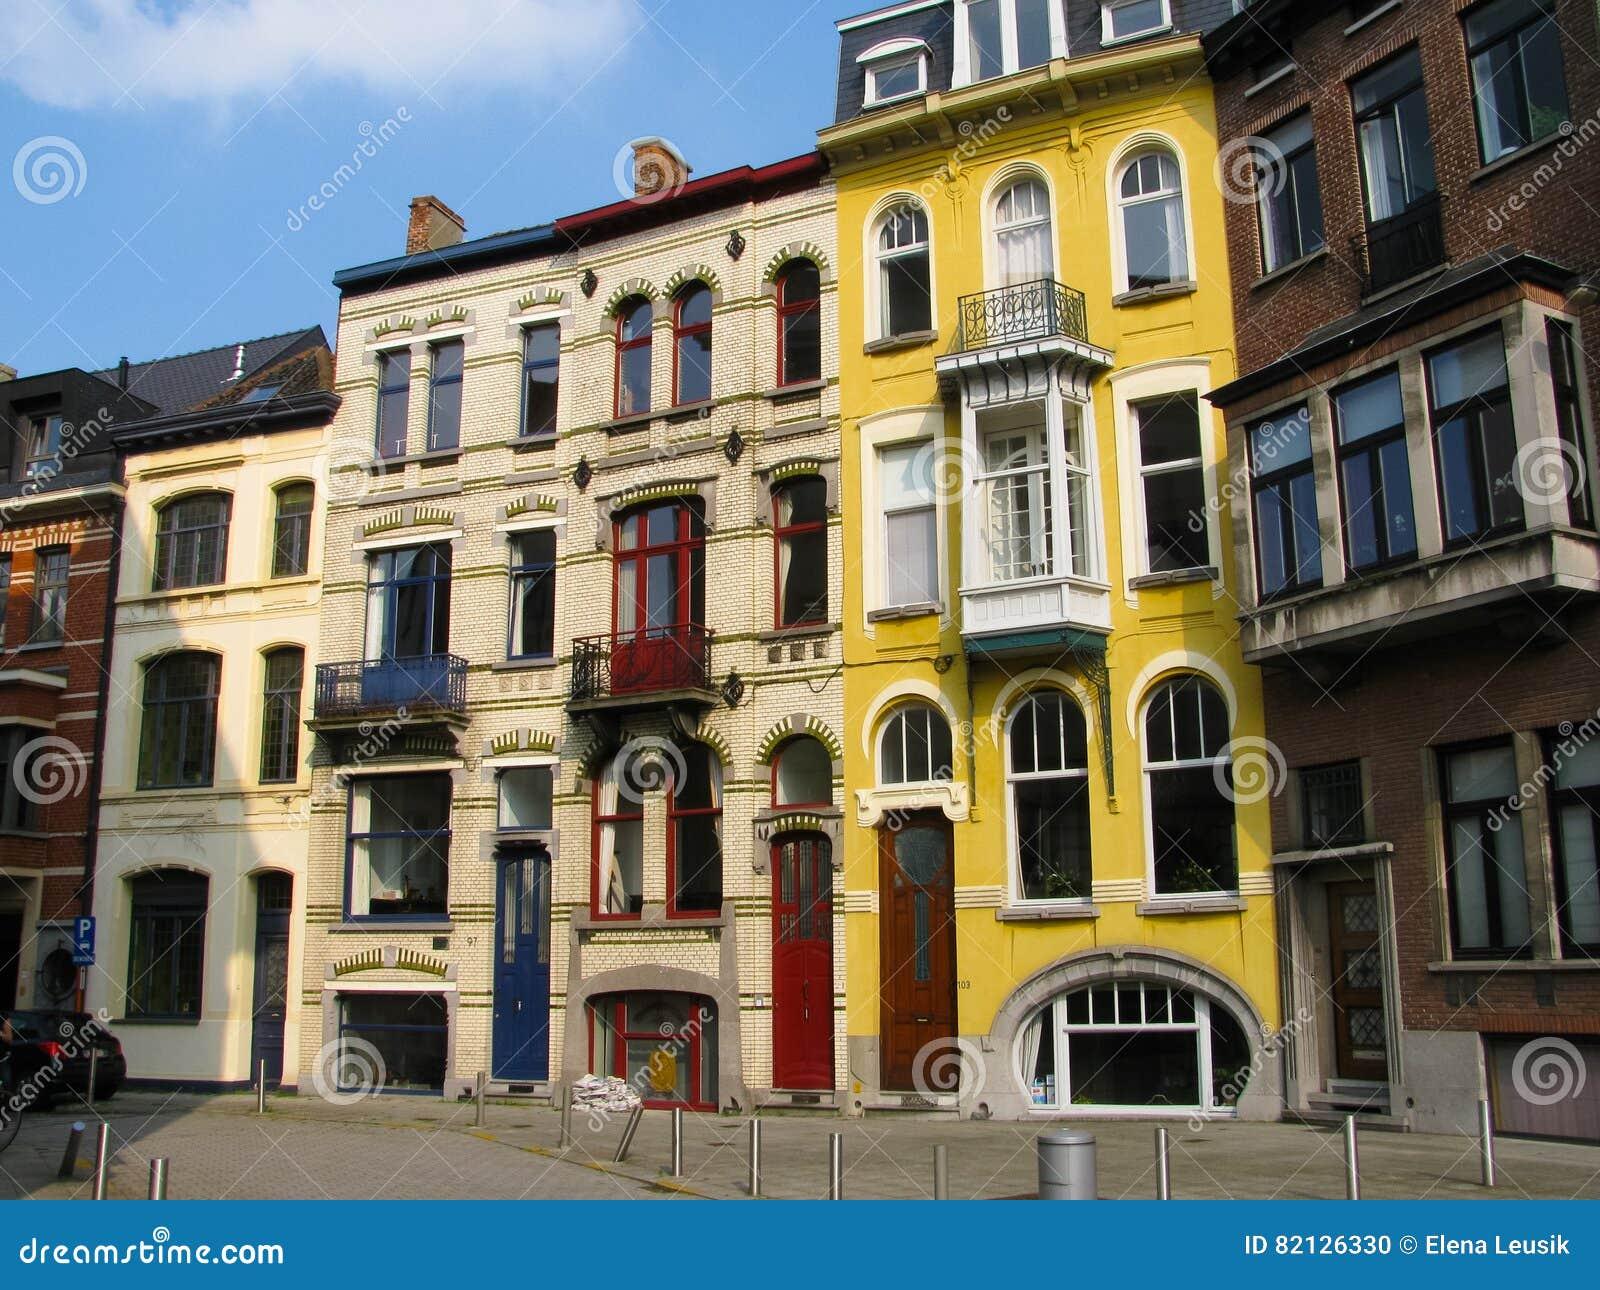 Art Nouveau New Art Modern Buildings In Ghent Belgium